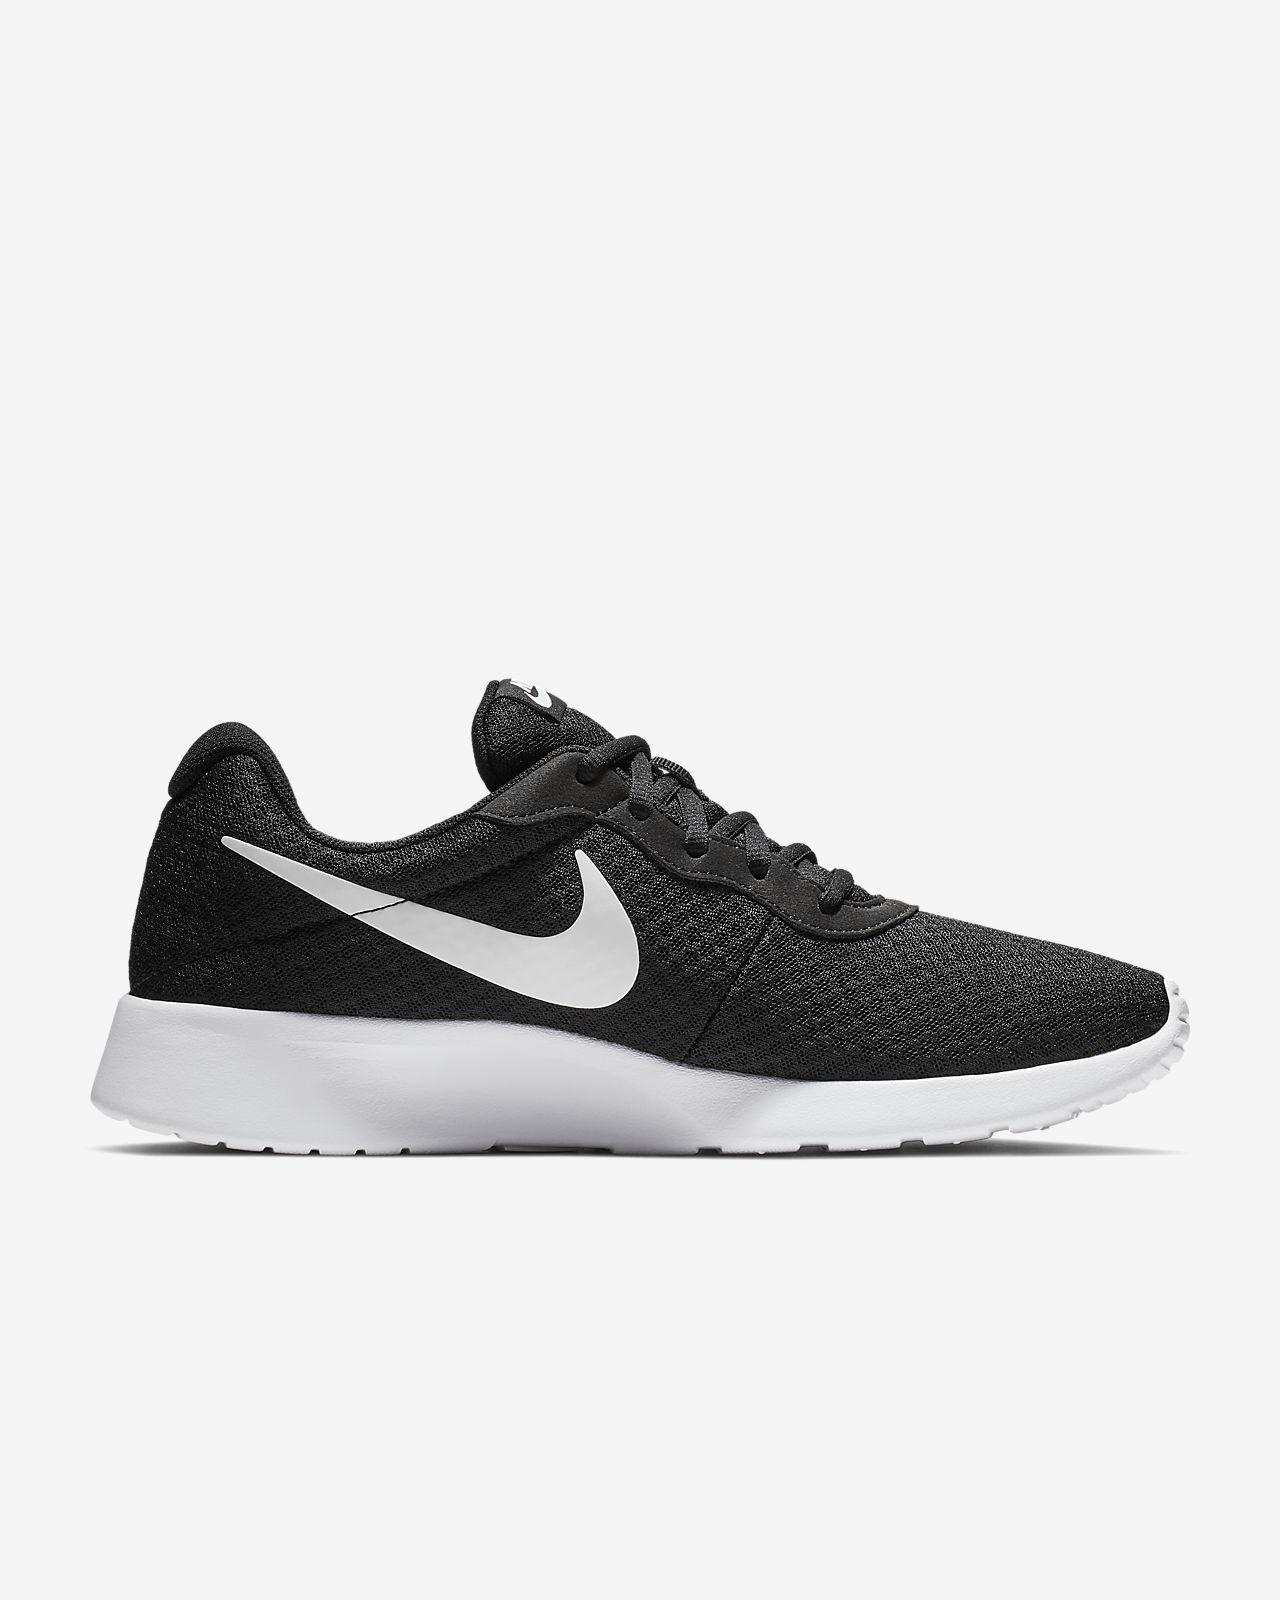 save off bd4c6 74d80 ... Nike Tanjun Zapatillas - Hombre